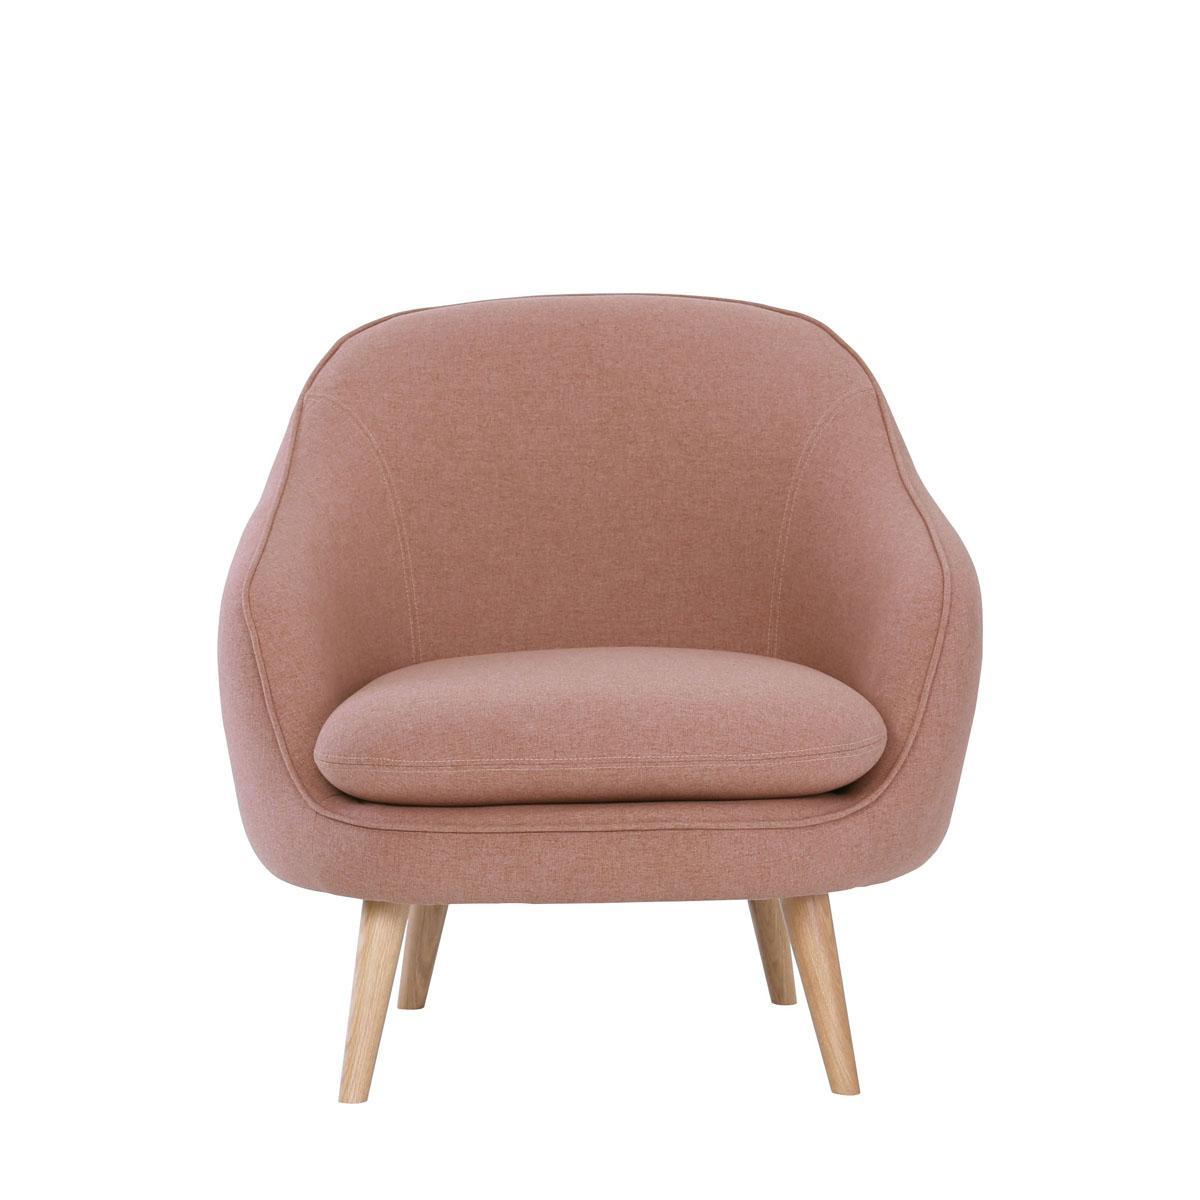 Prius Armchair Oak Leg for Living Room. Scandinavian Designer Chair